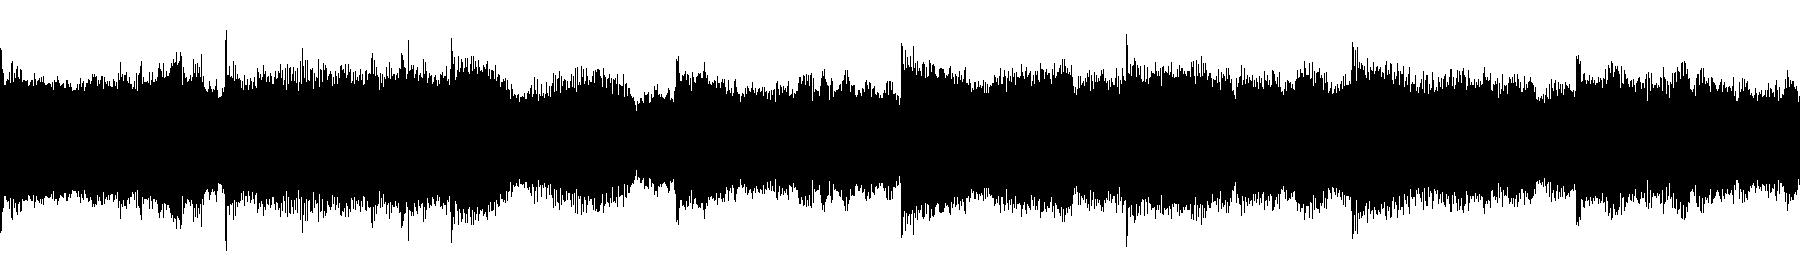 vedh melodyloop 026 gm f dm e 124bpm